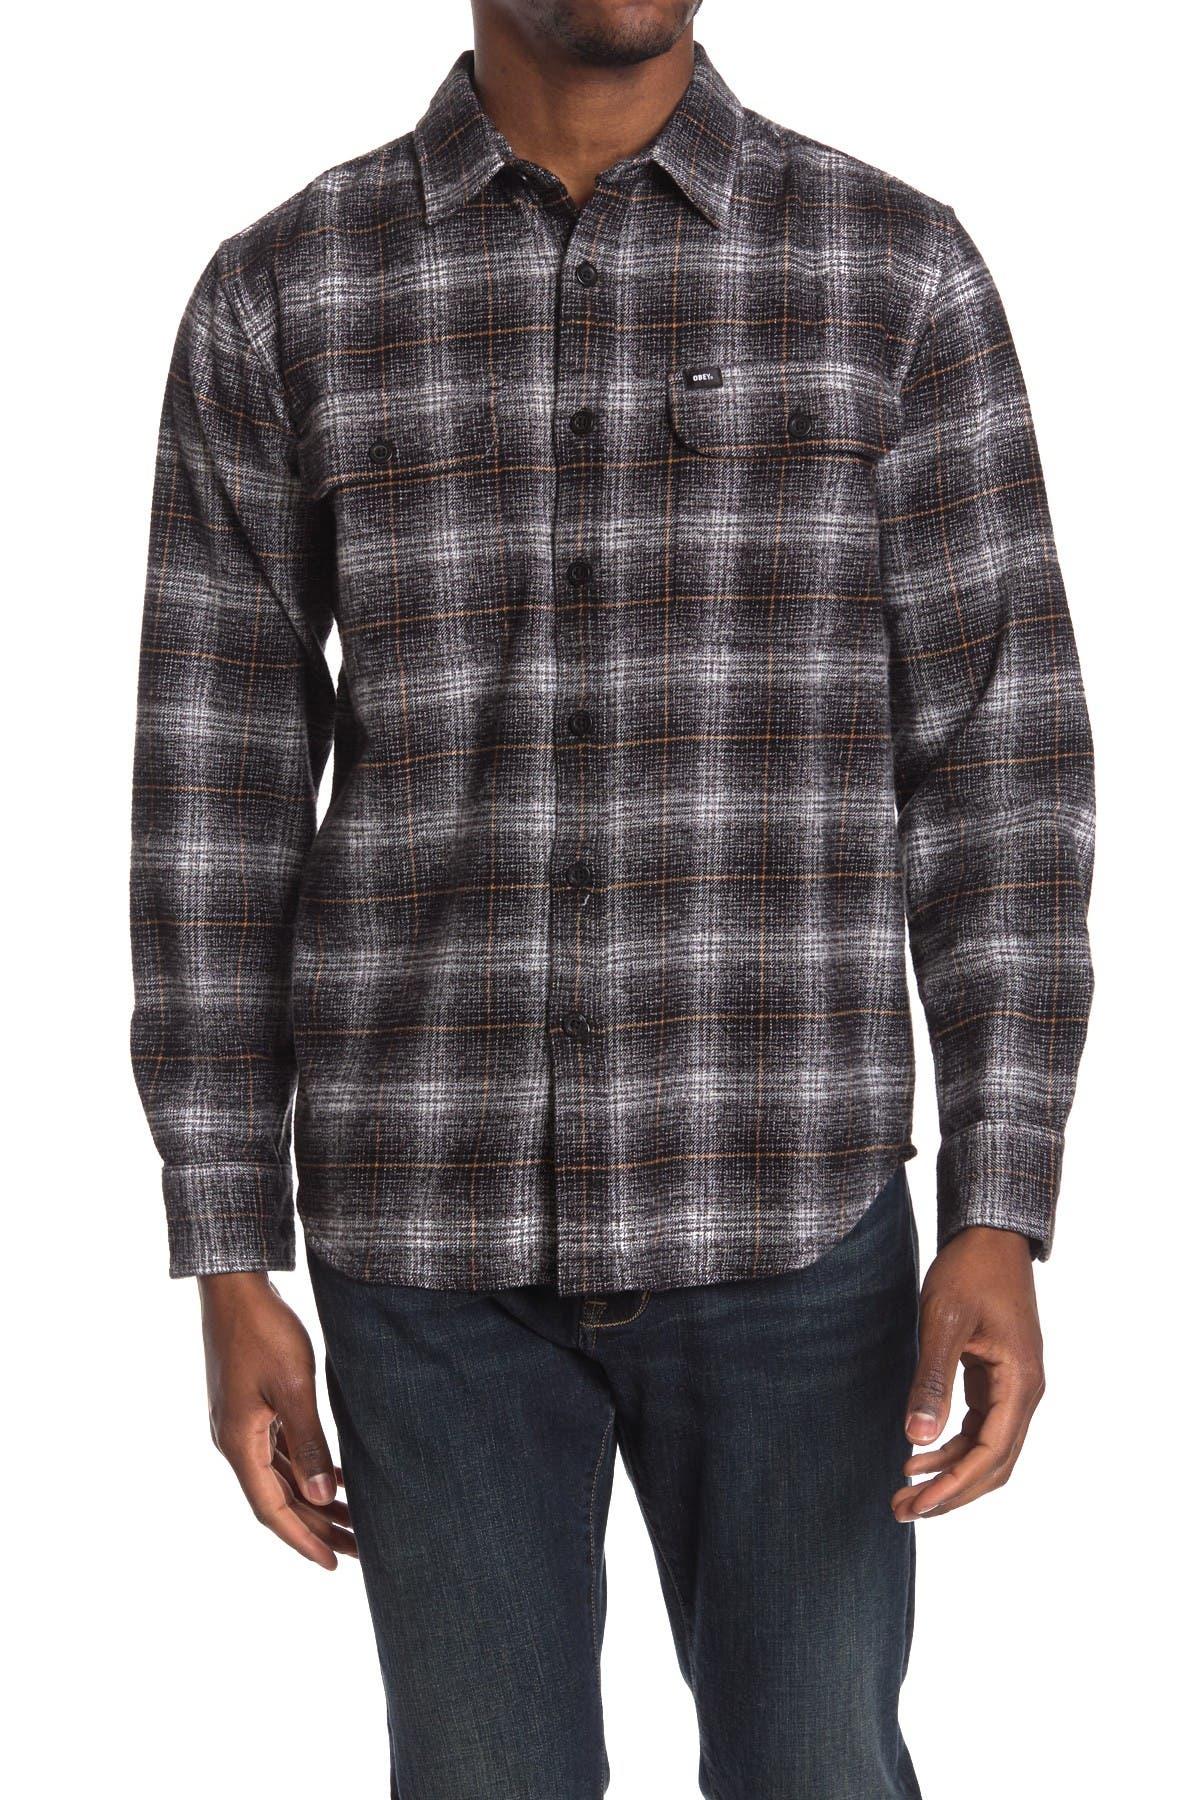 Image of Obey Shriner Woven Long Sleeve Regular Fit Shirt